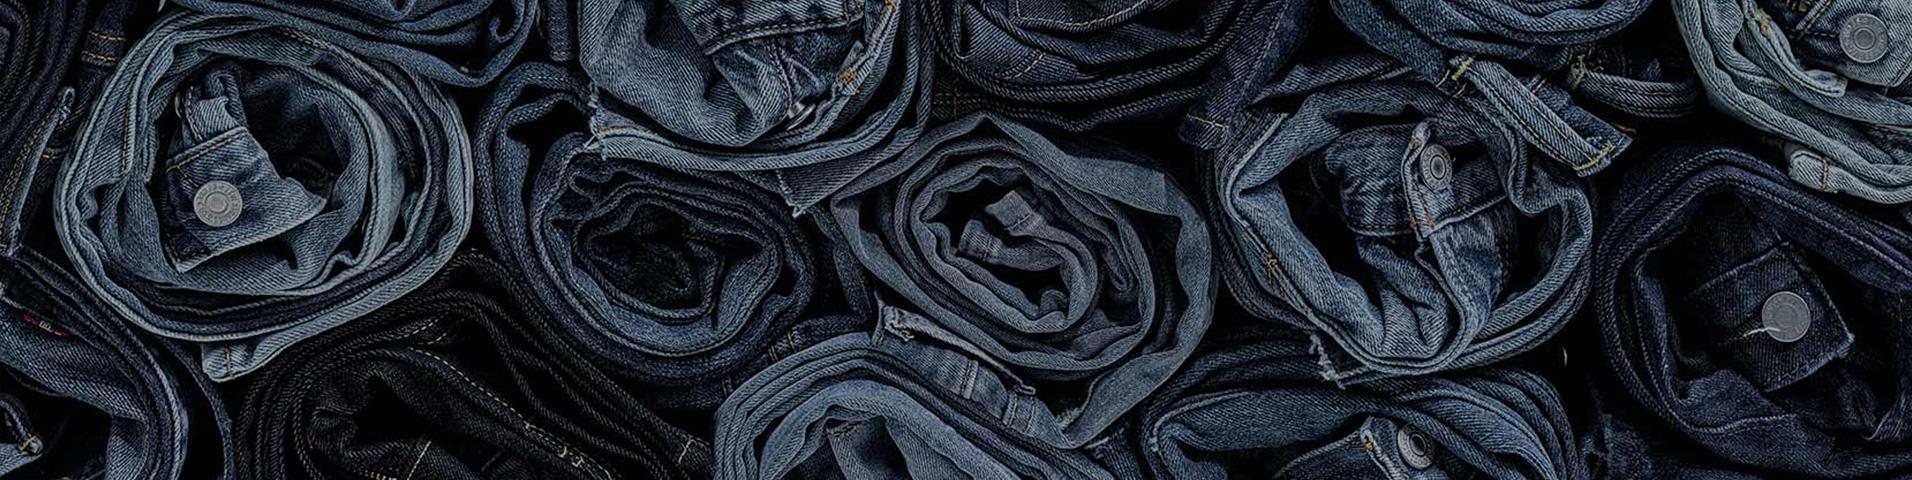 Till jeansguiden